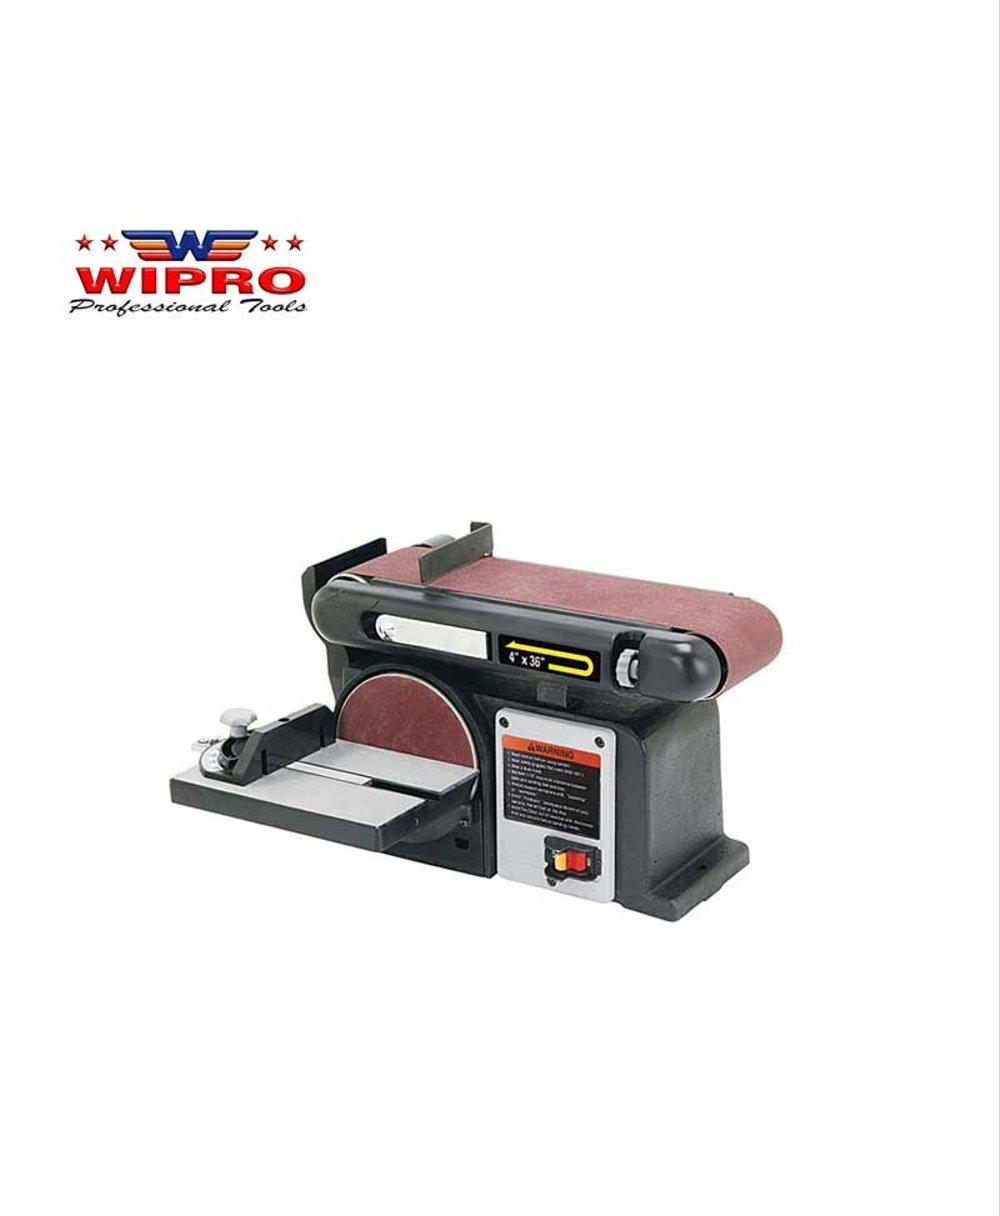 "Wipro 491D Mesin Amplas Belt duduk 4"" x 6"""